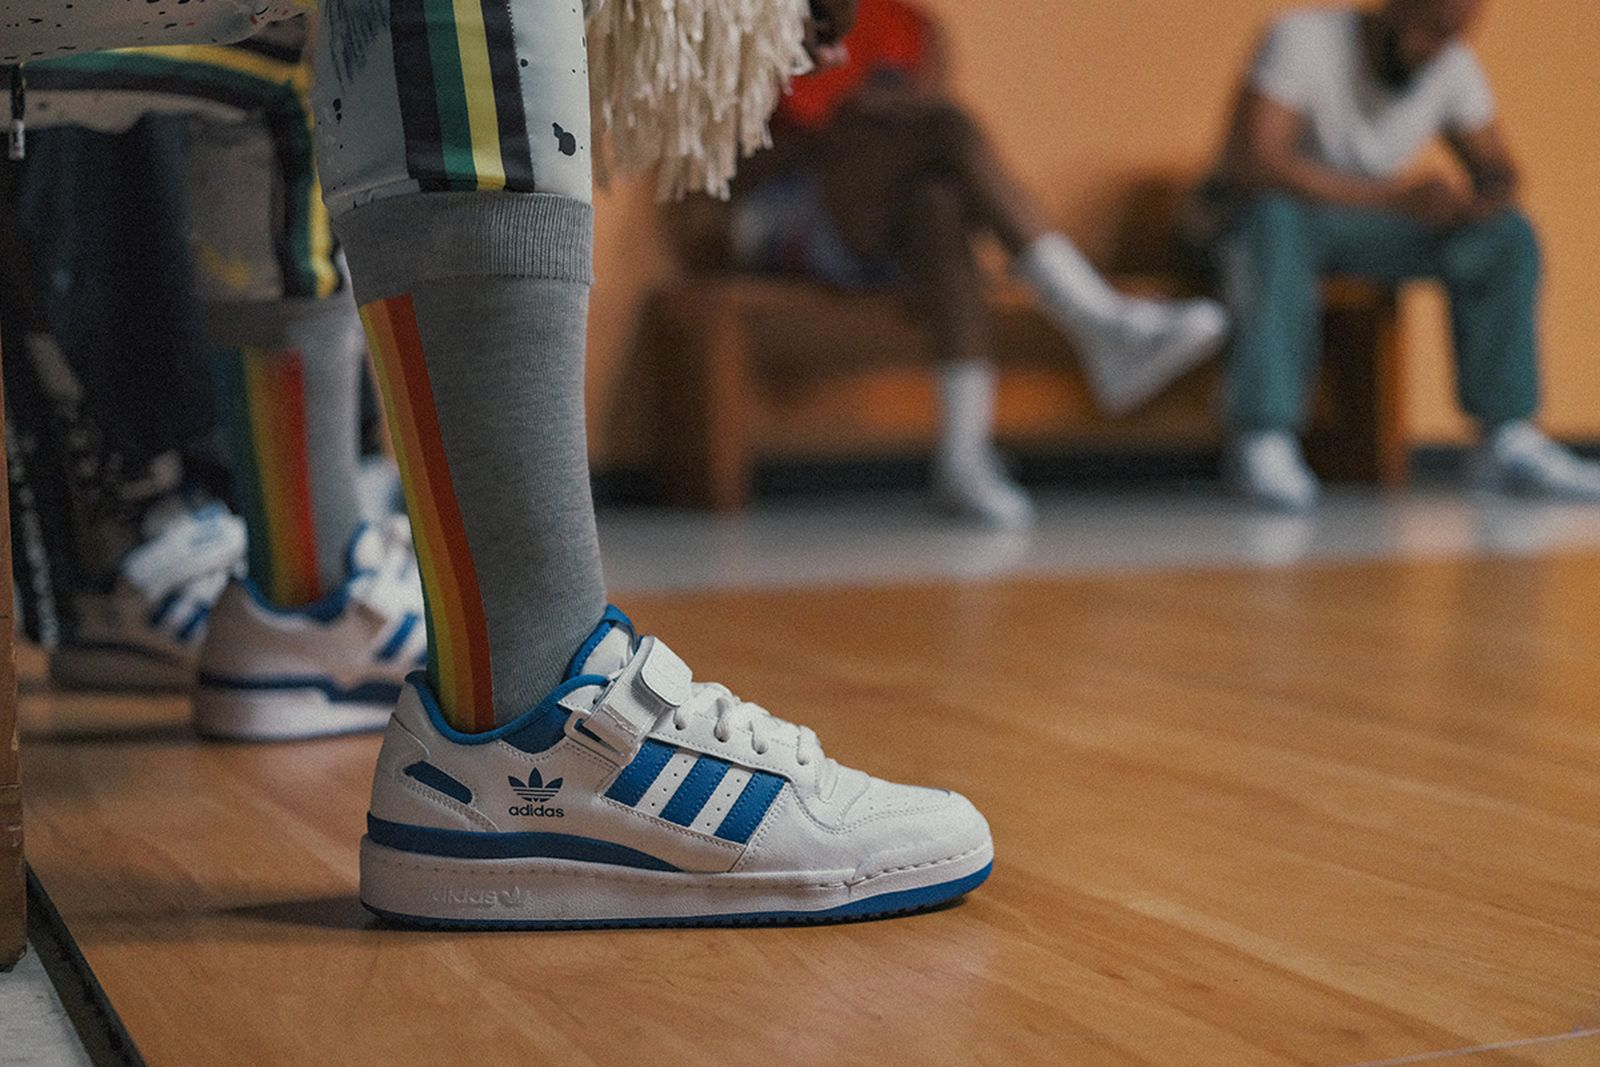 Adidas-Detroit-05